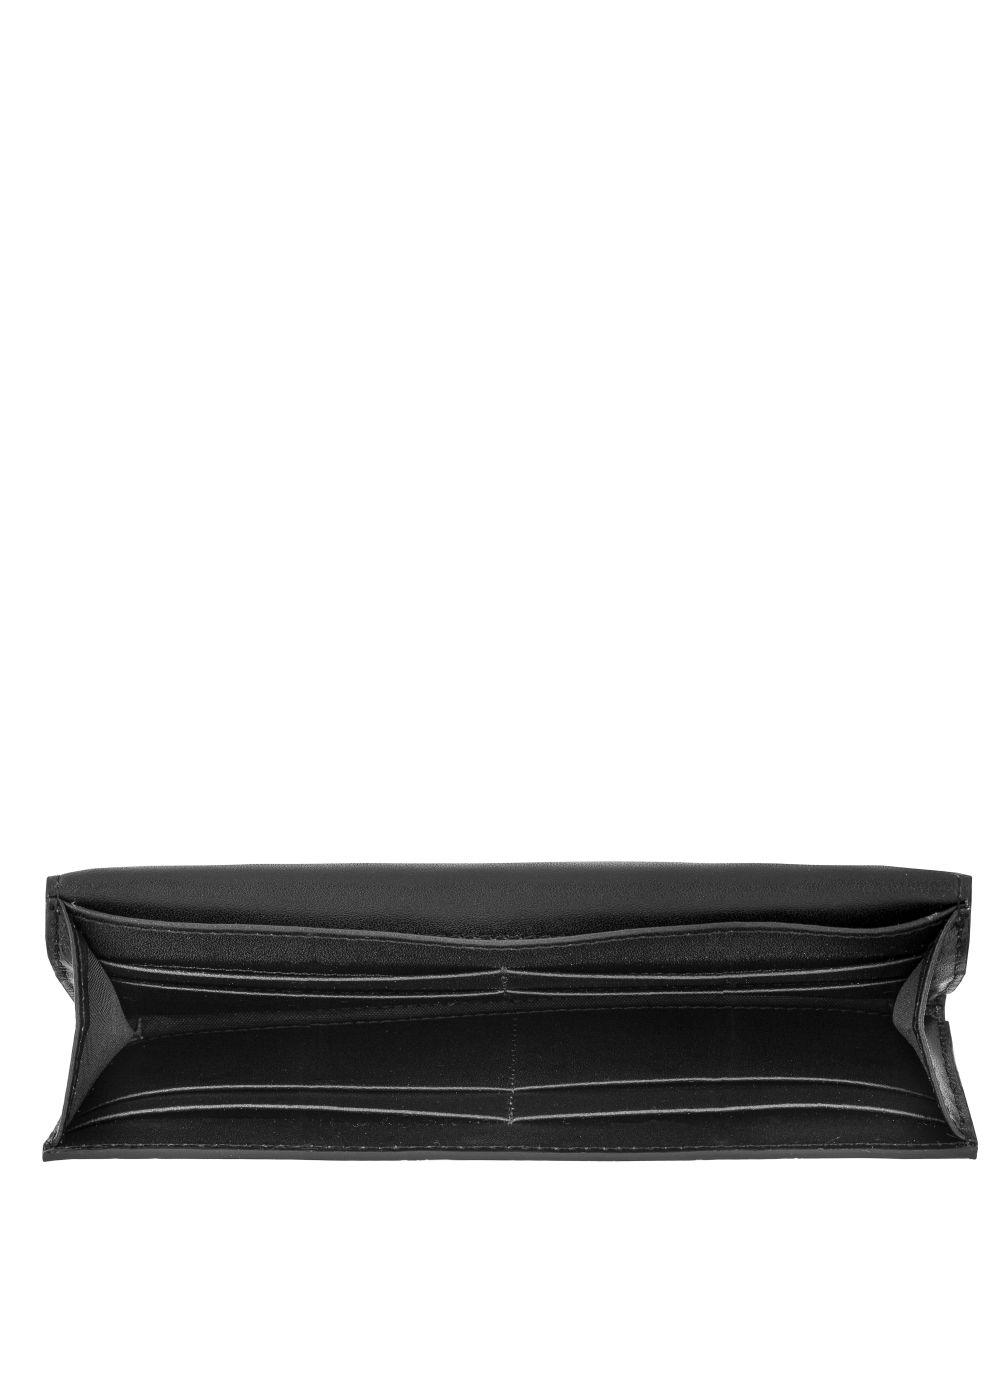 Portfel damski PORES-0360-99(W20)